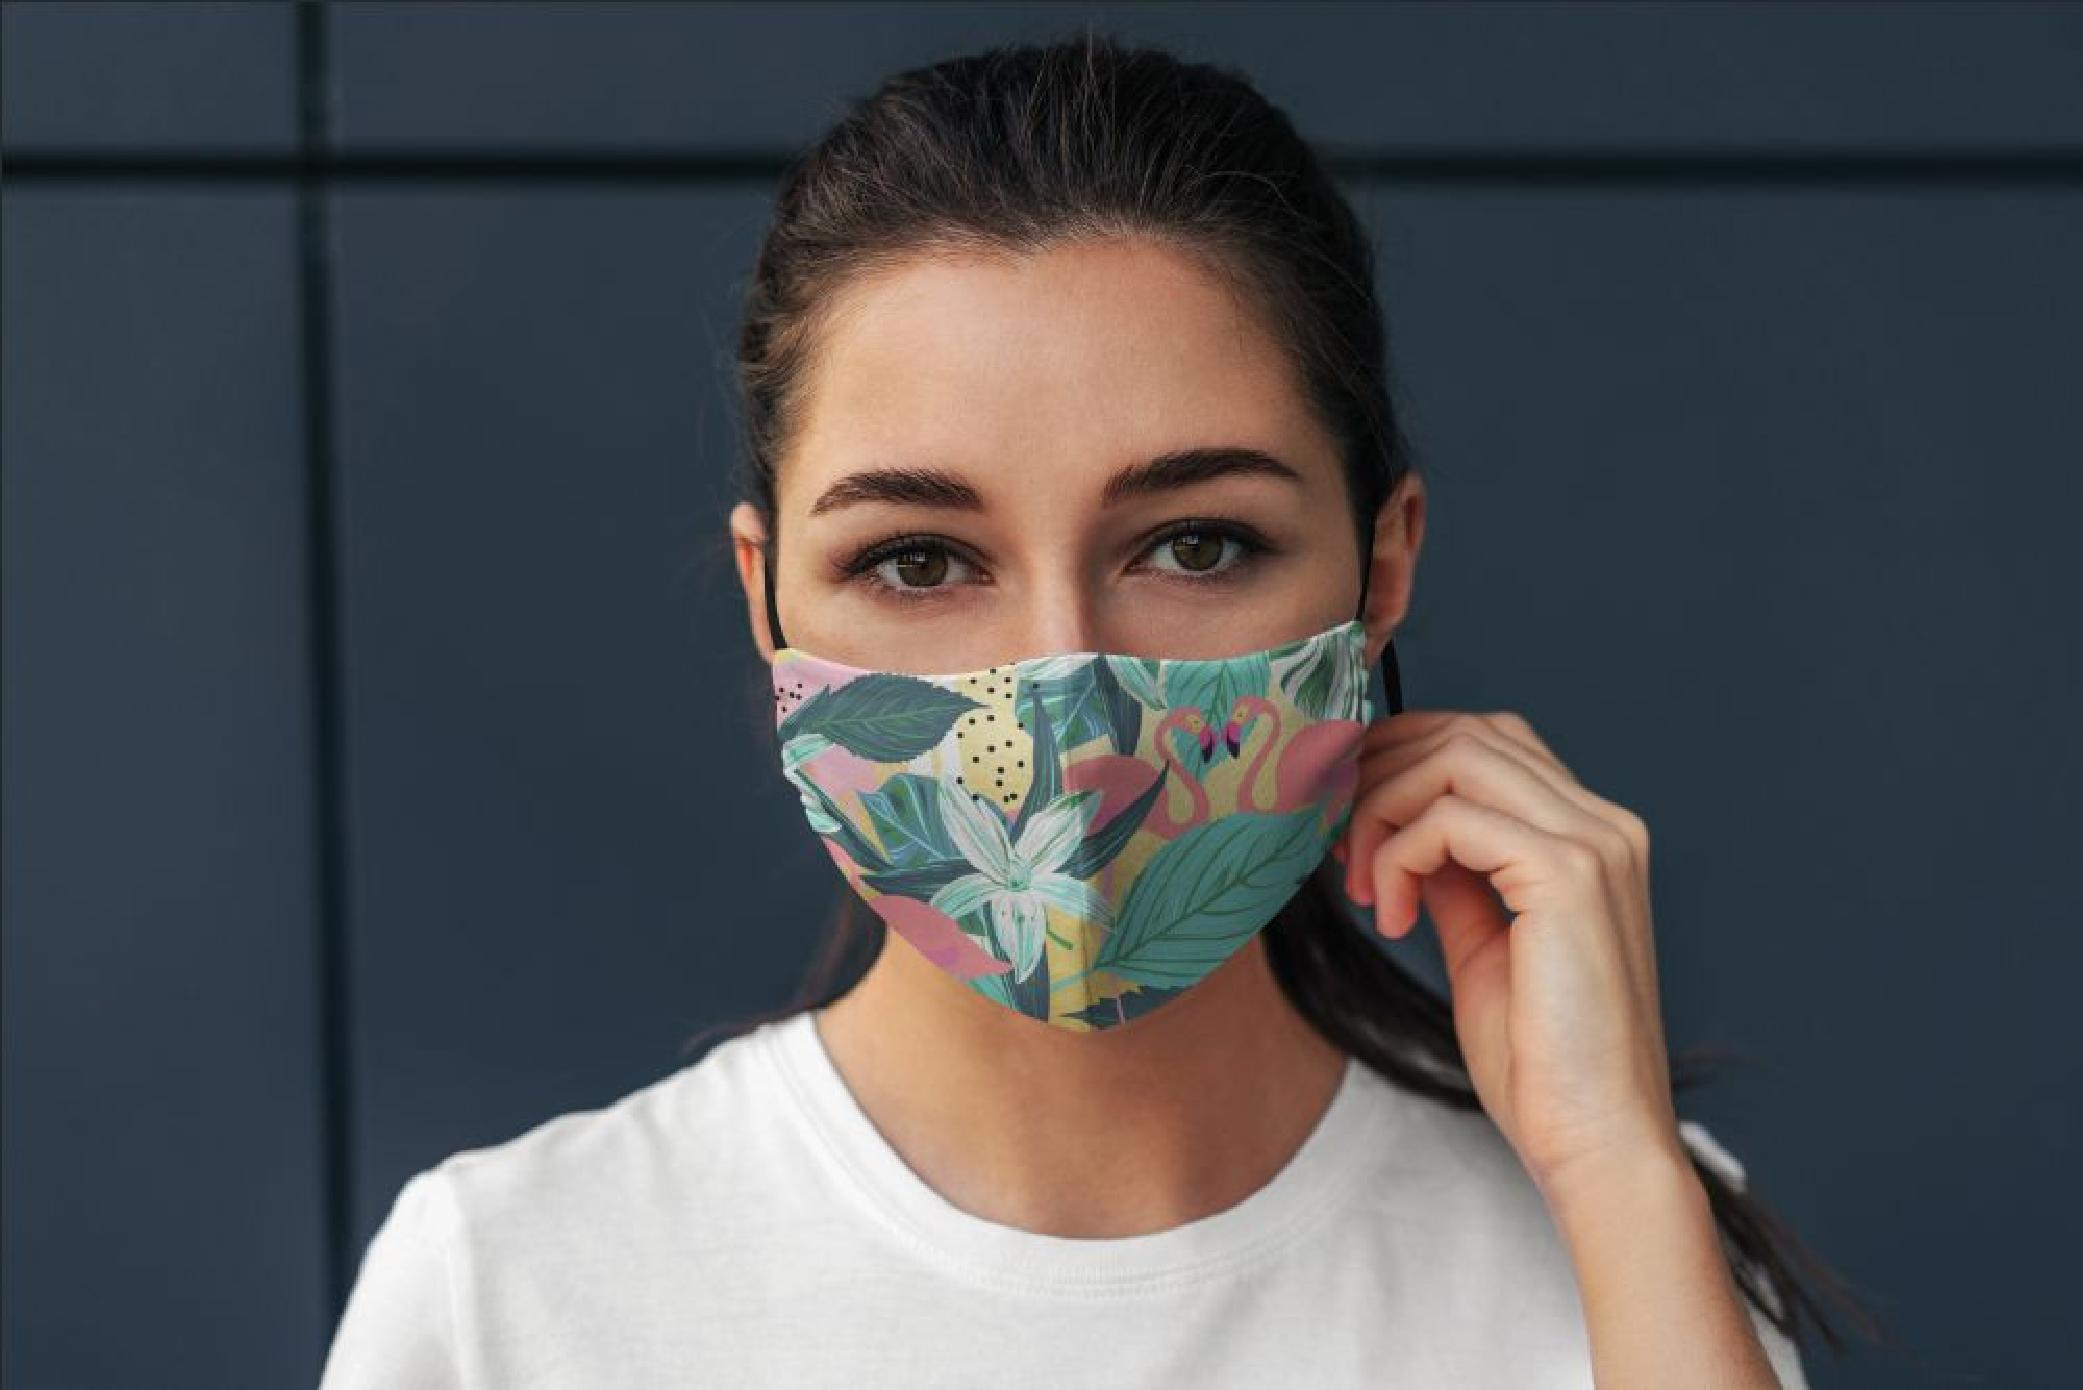 Mască Flamingo - 29 LEI |  PRINTCENTER - Tipar digital, offset, indoor, outdoor